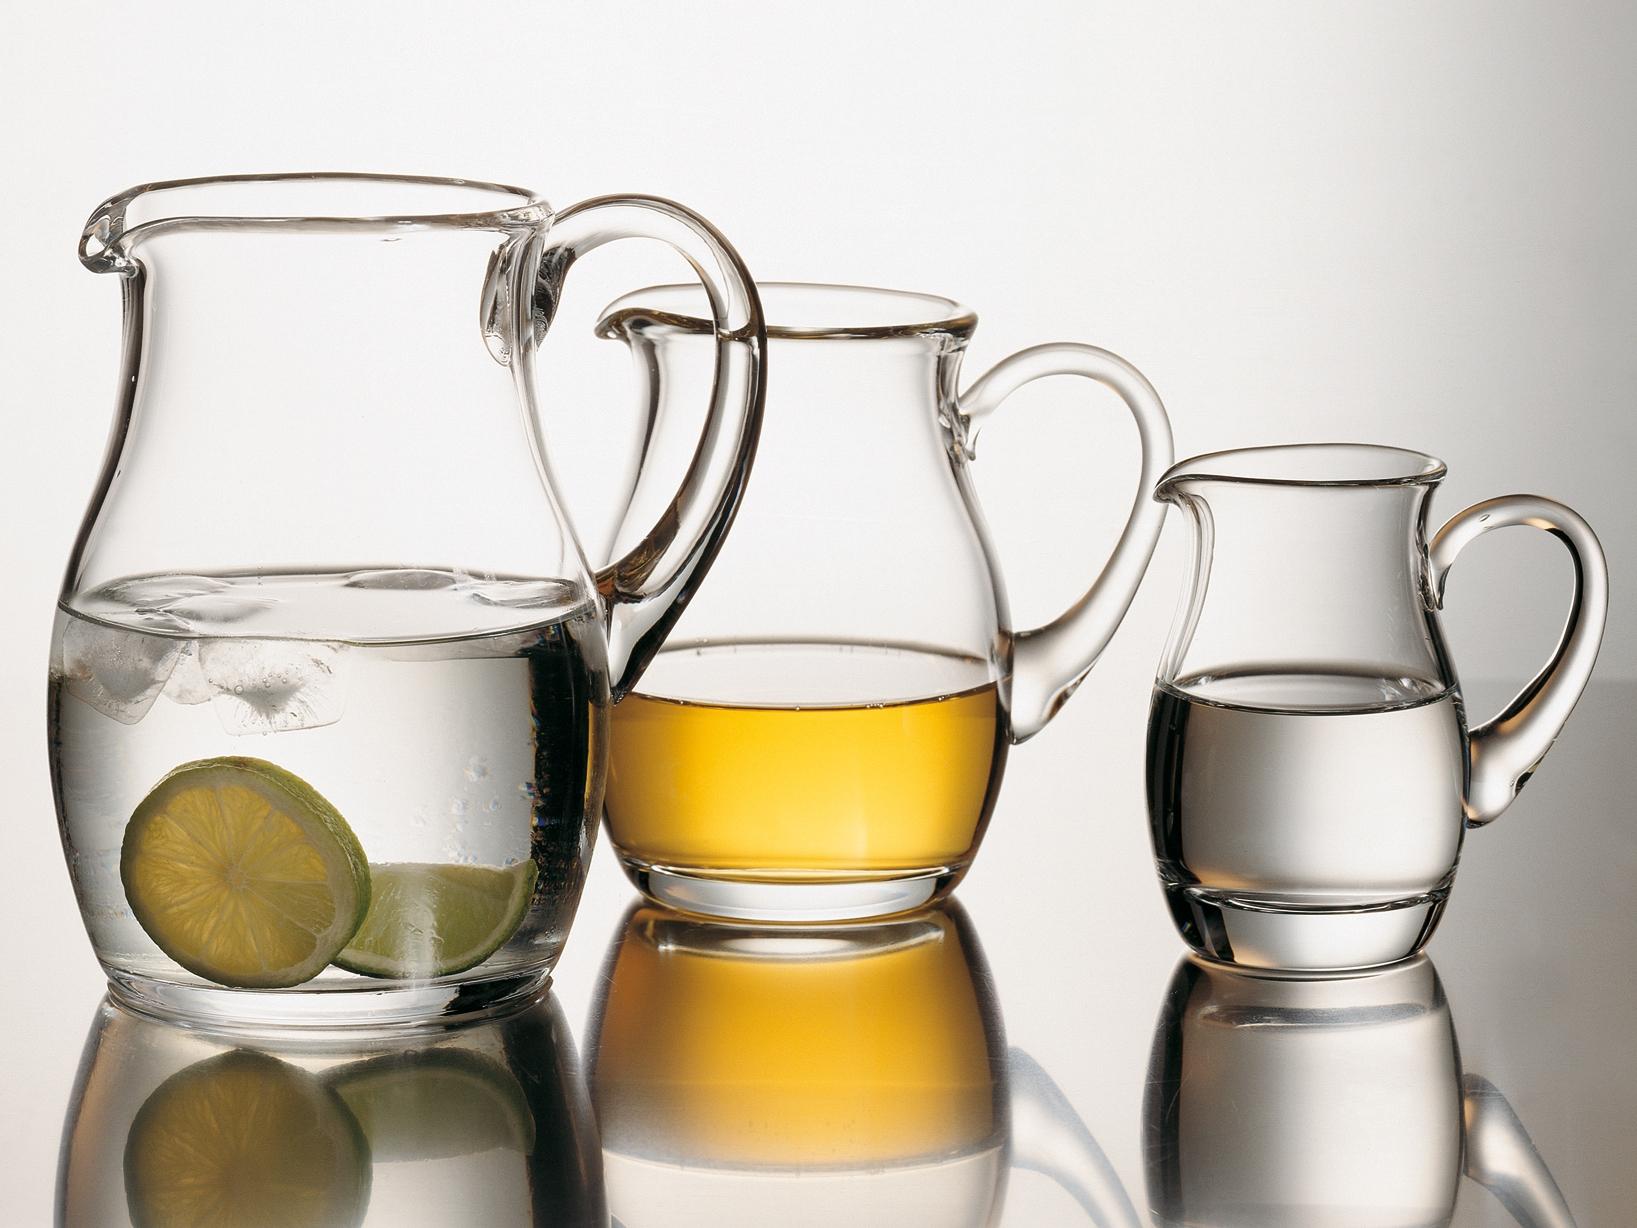 Buy Blown Glass Jug Paraggi Lt1 17457189 | Queency.co.uk